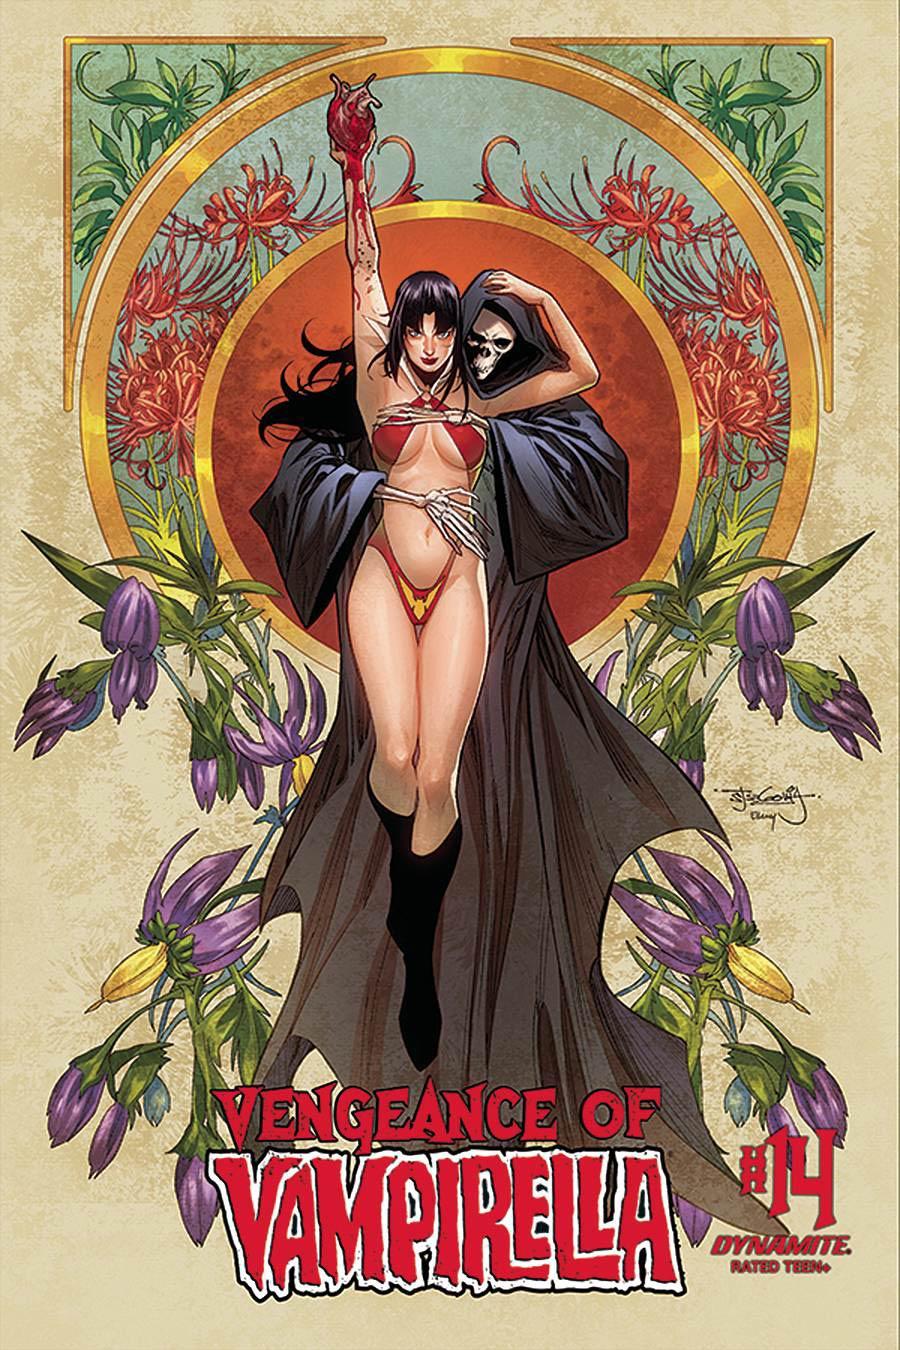 Vengeance Of Vampirella Vol 2 #14 Cover C Variant Stephen Segovia Cover